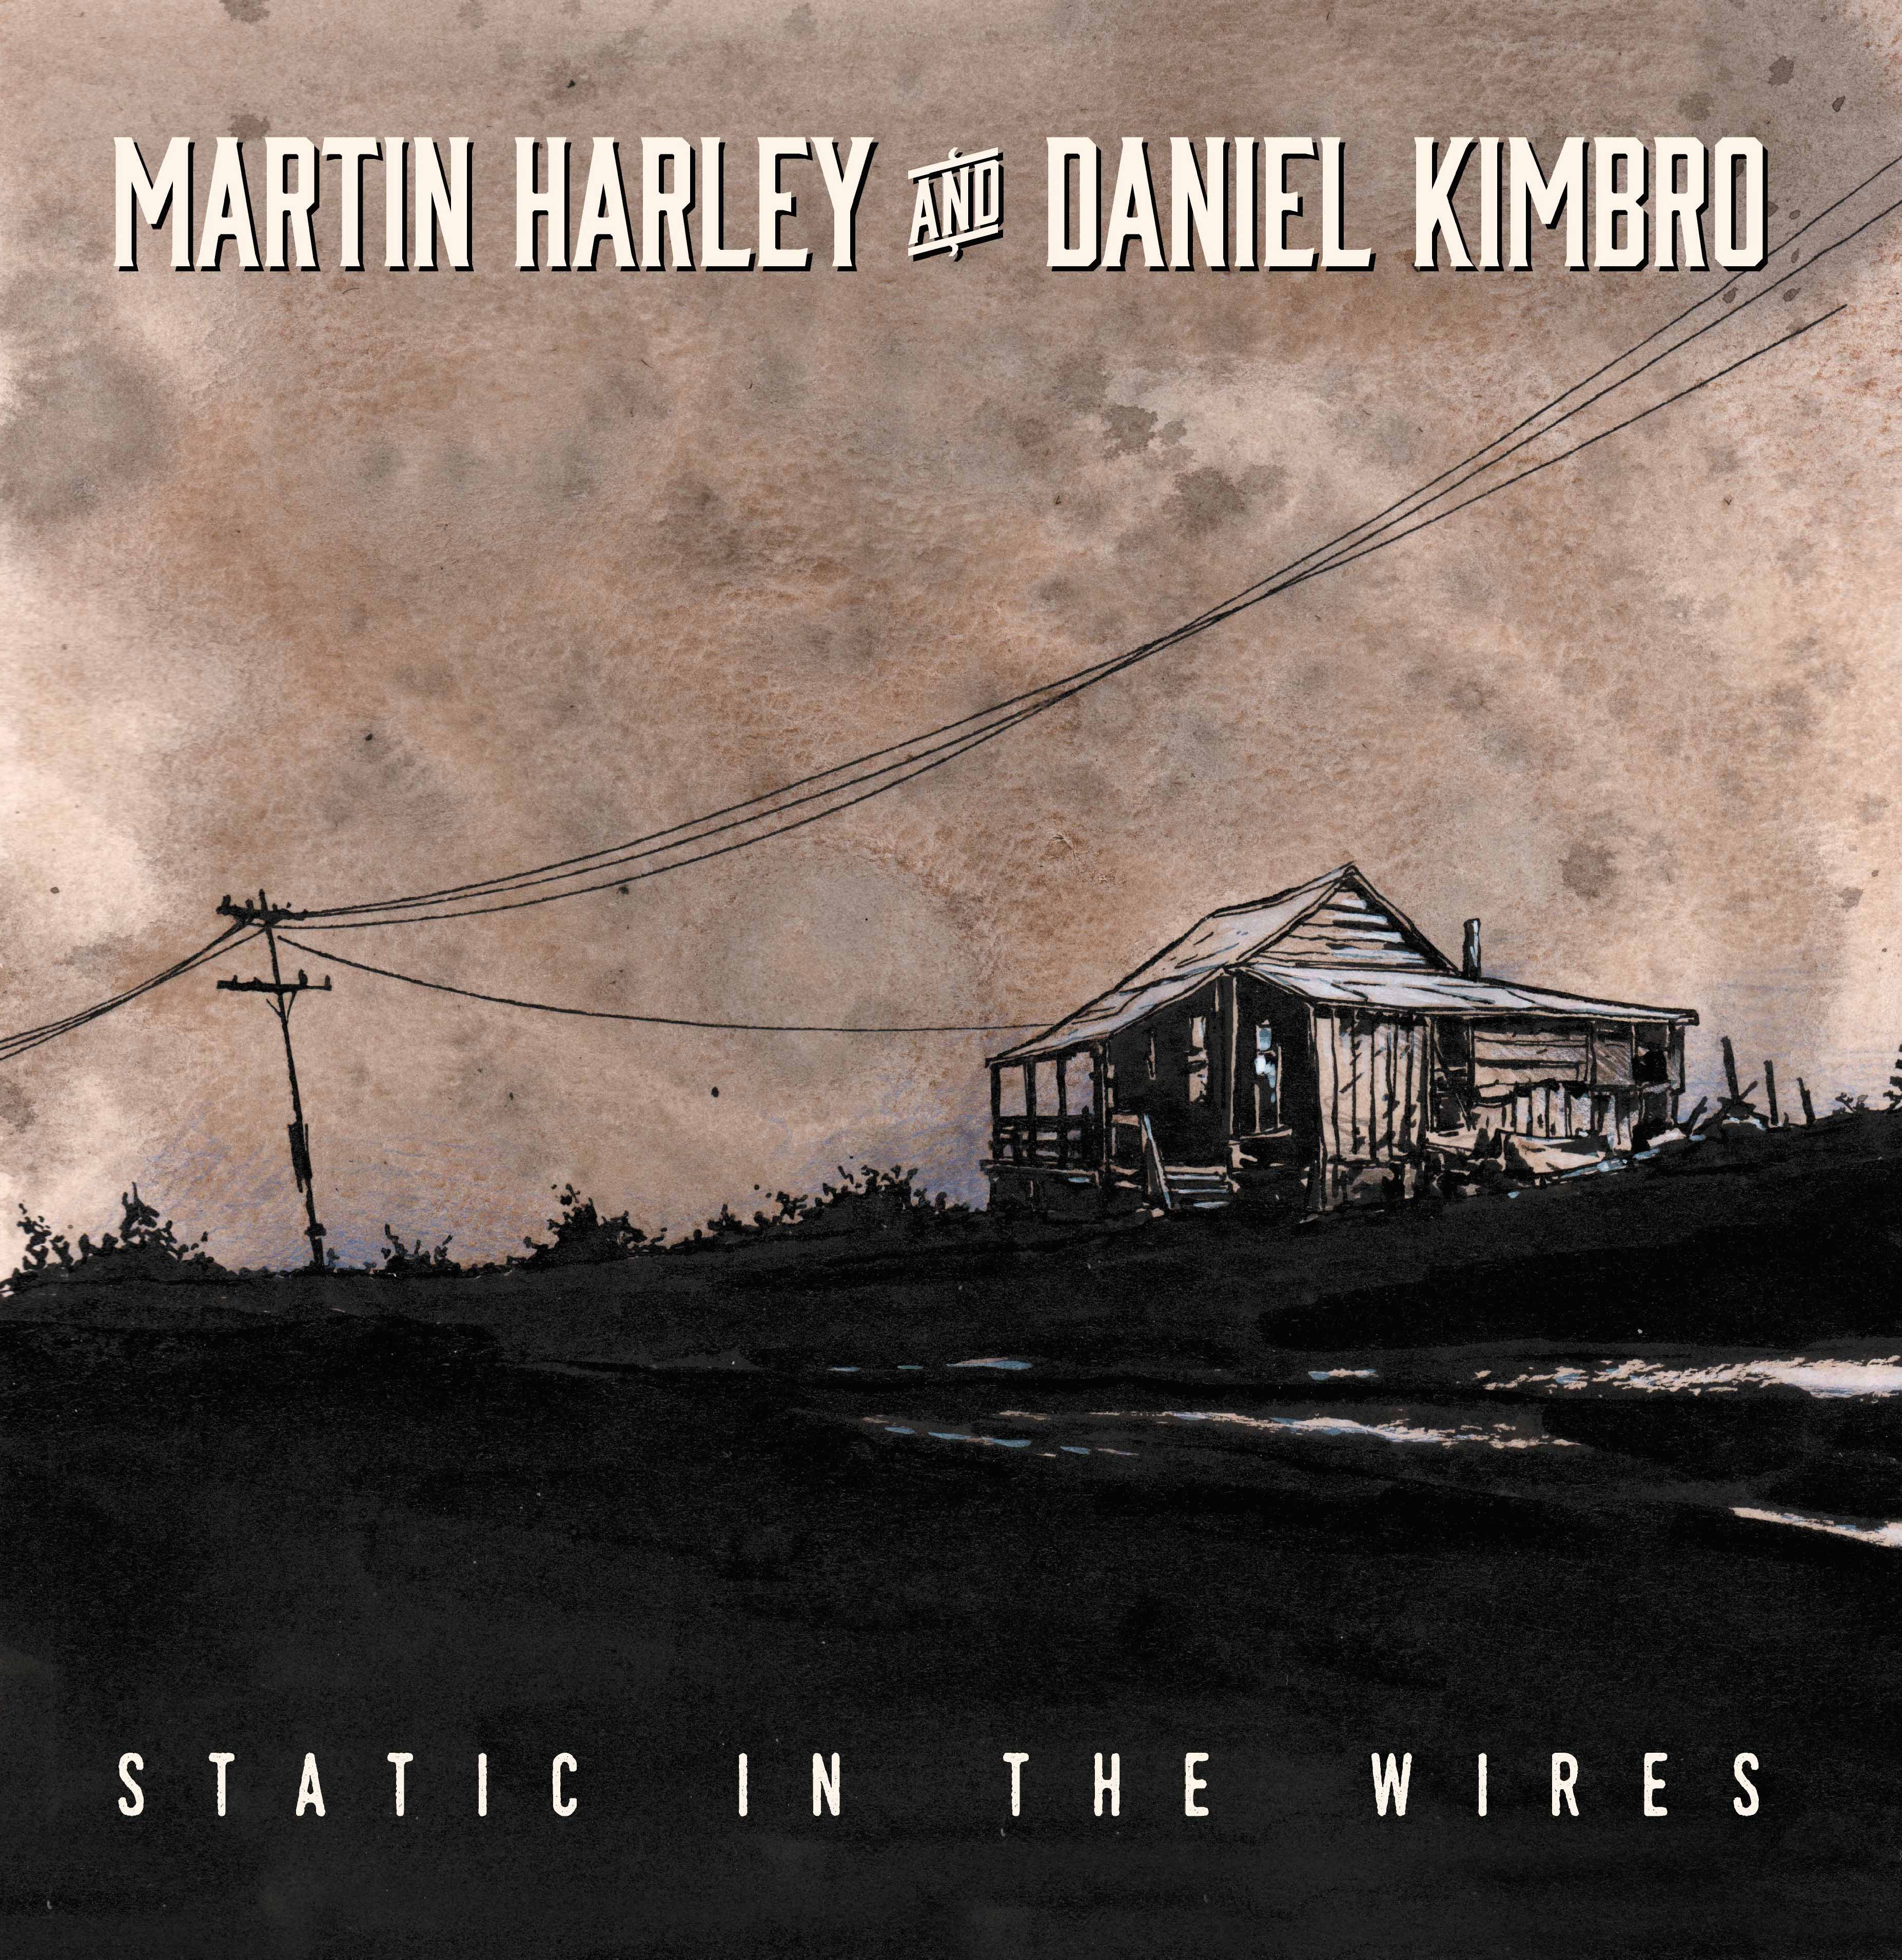 Static in the Wires - Martin Harley & Daniel Kimbro CD - Martin Harley